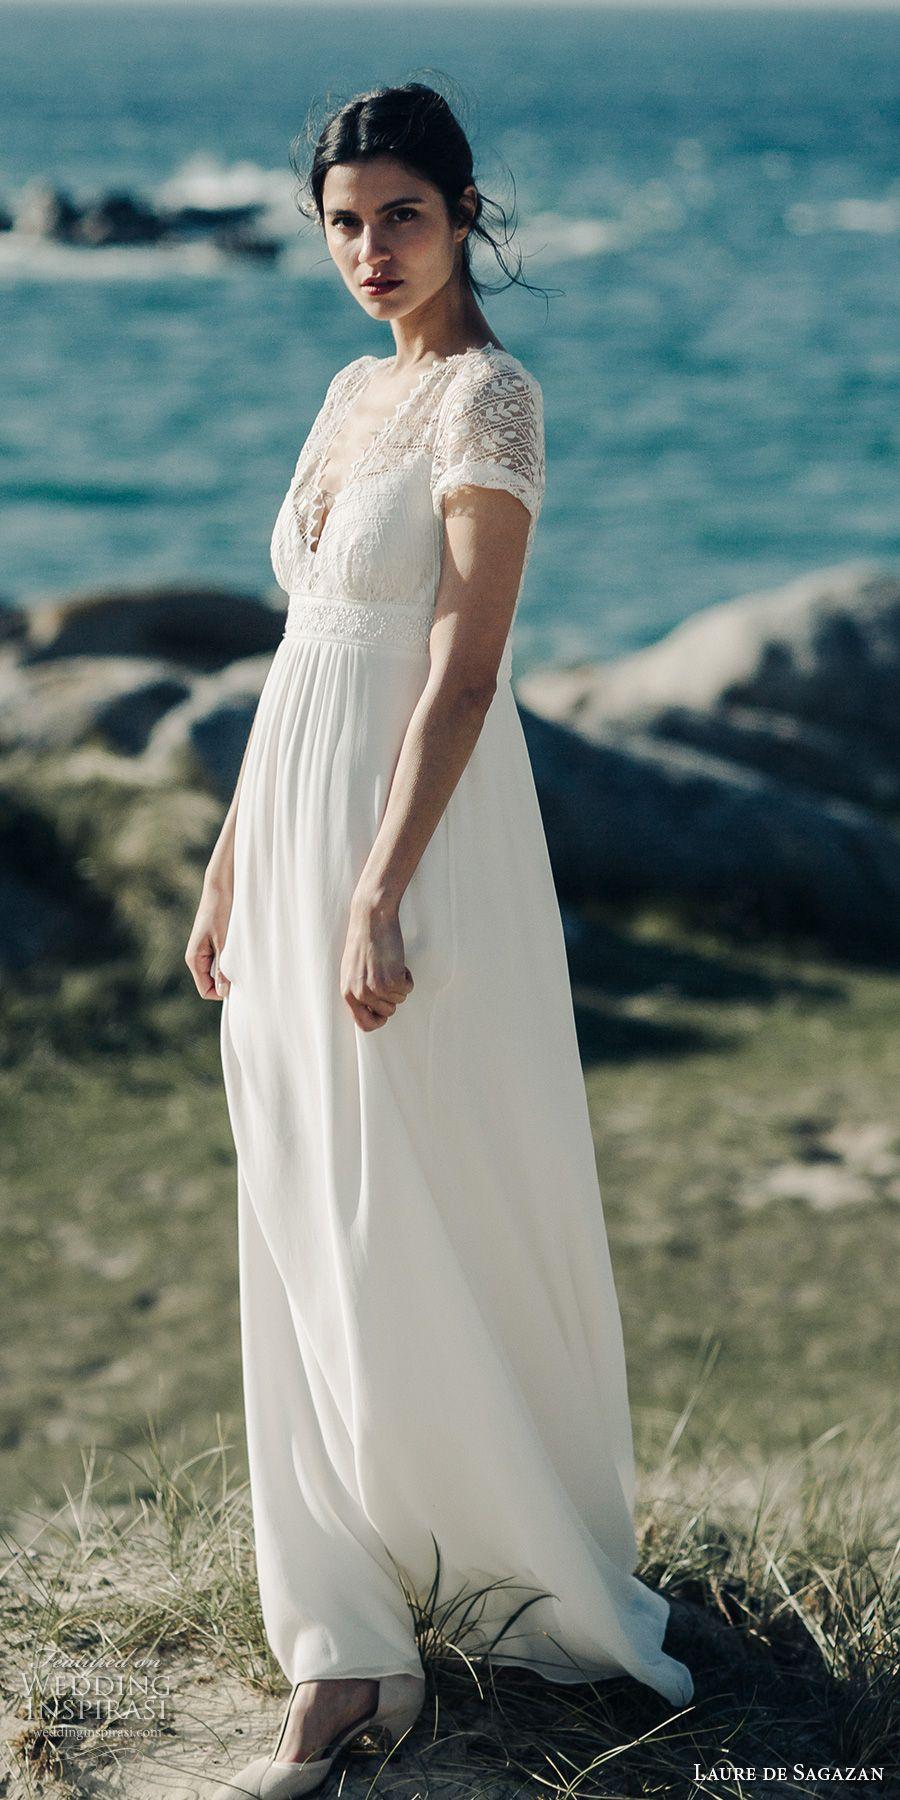 Laure de sagazan wedding dresses halve mouwen bruiloft en mouw